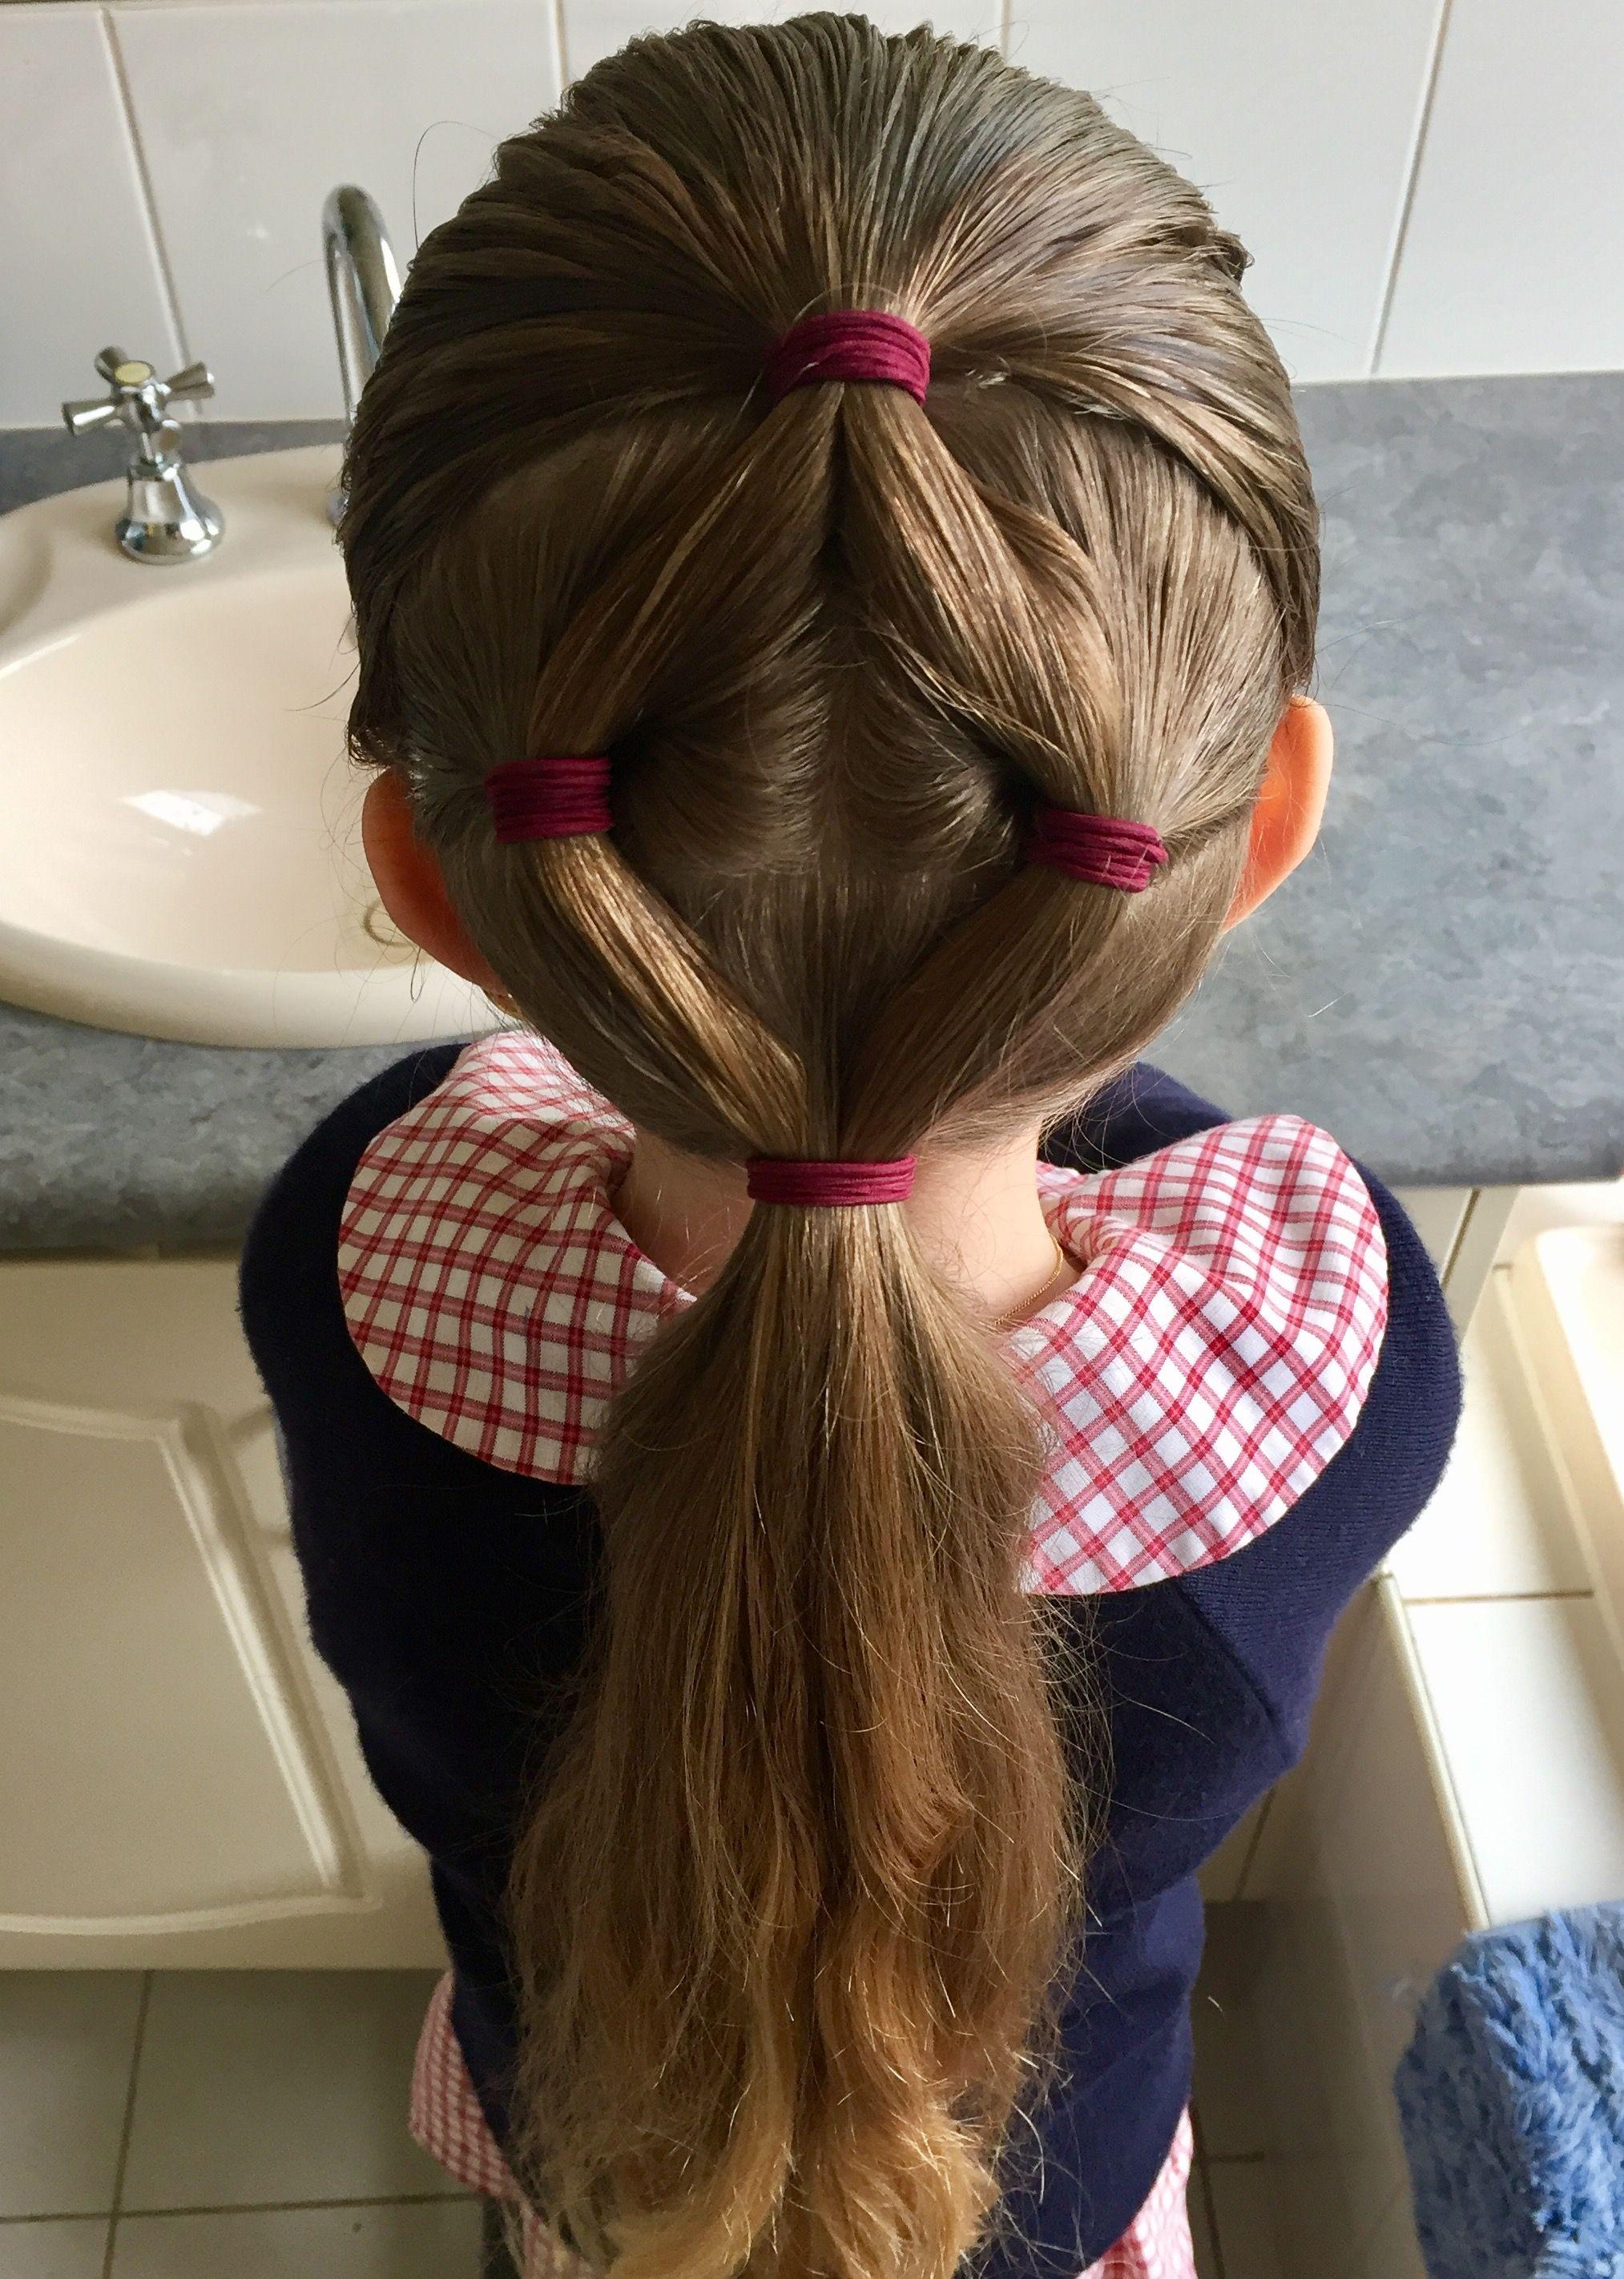 Little girls hair | Hairstyles | Pinterest | Girl hair ...